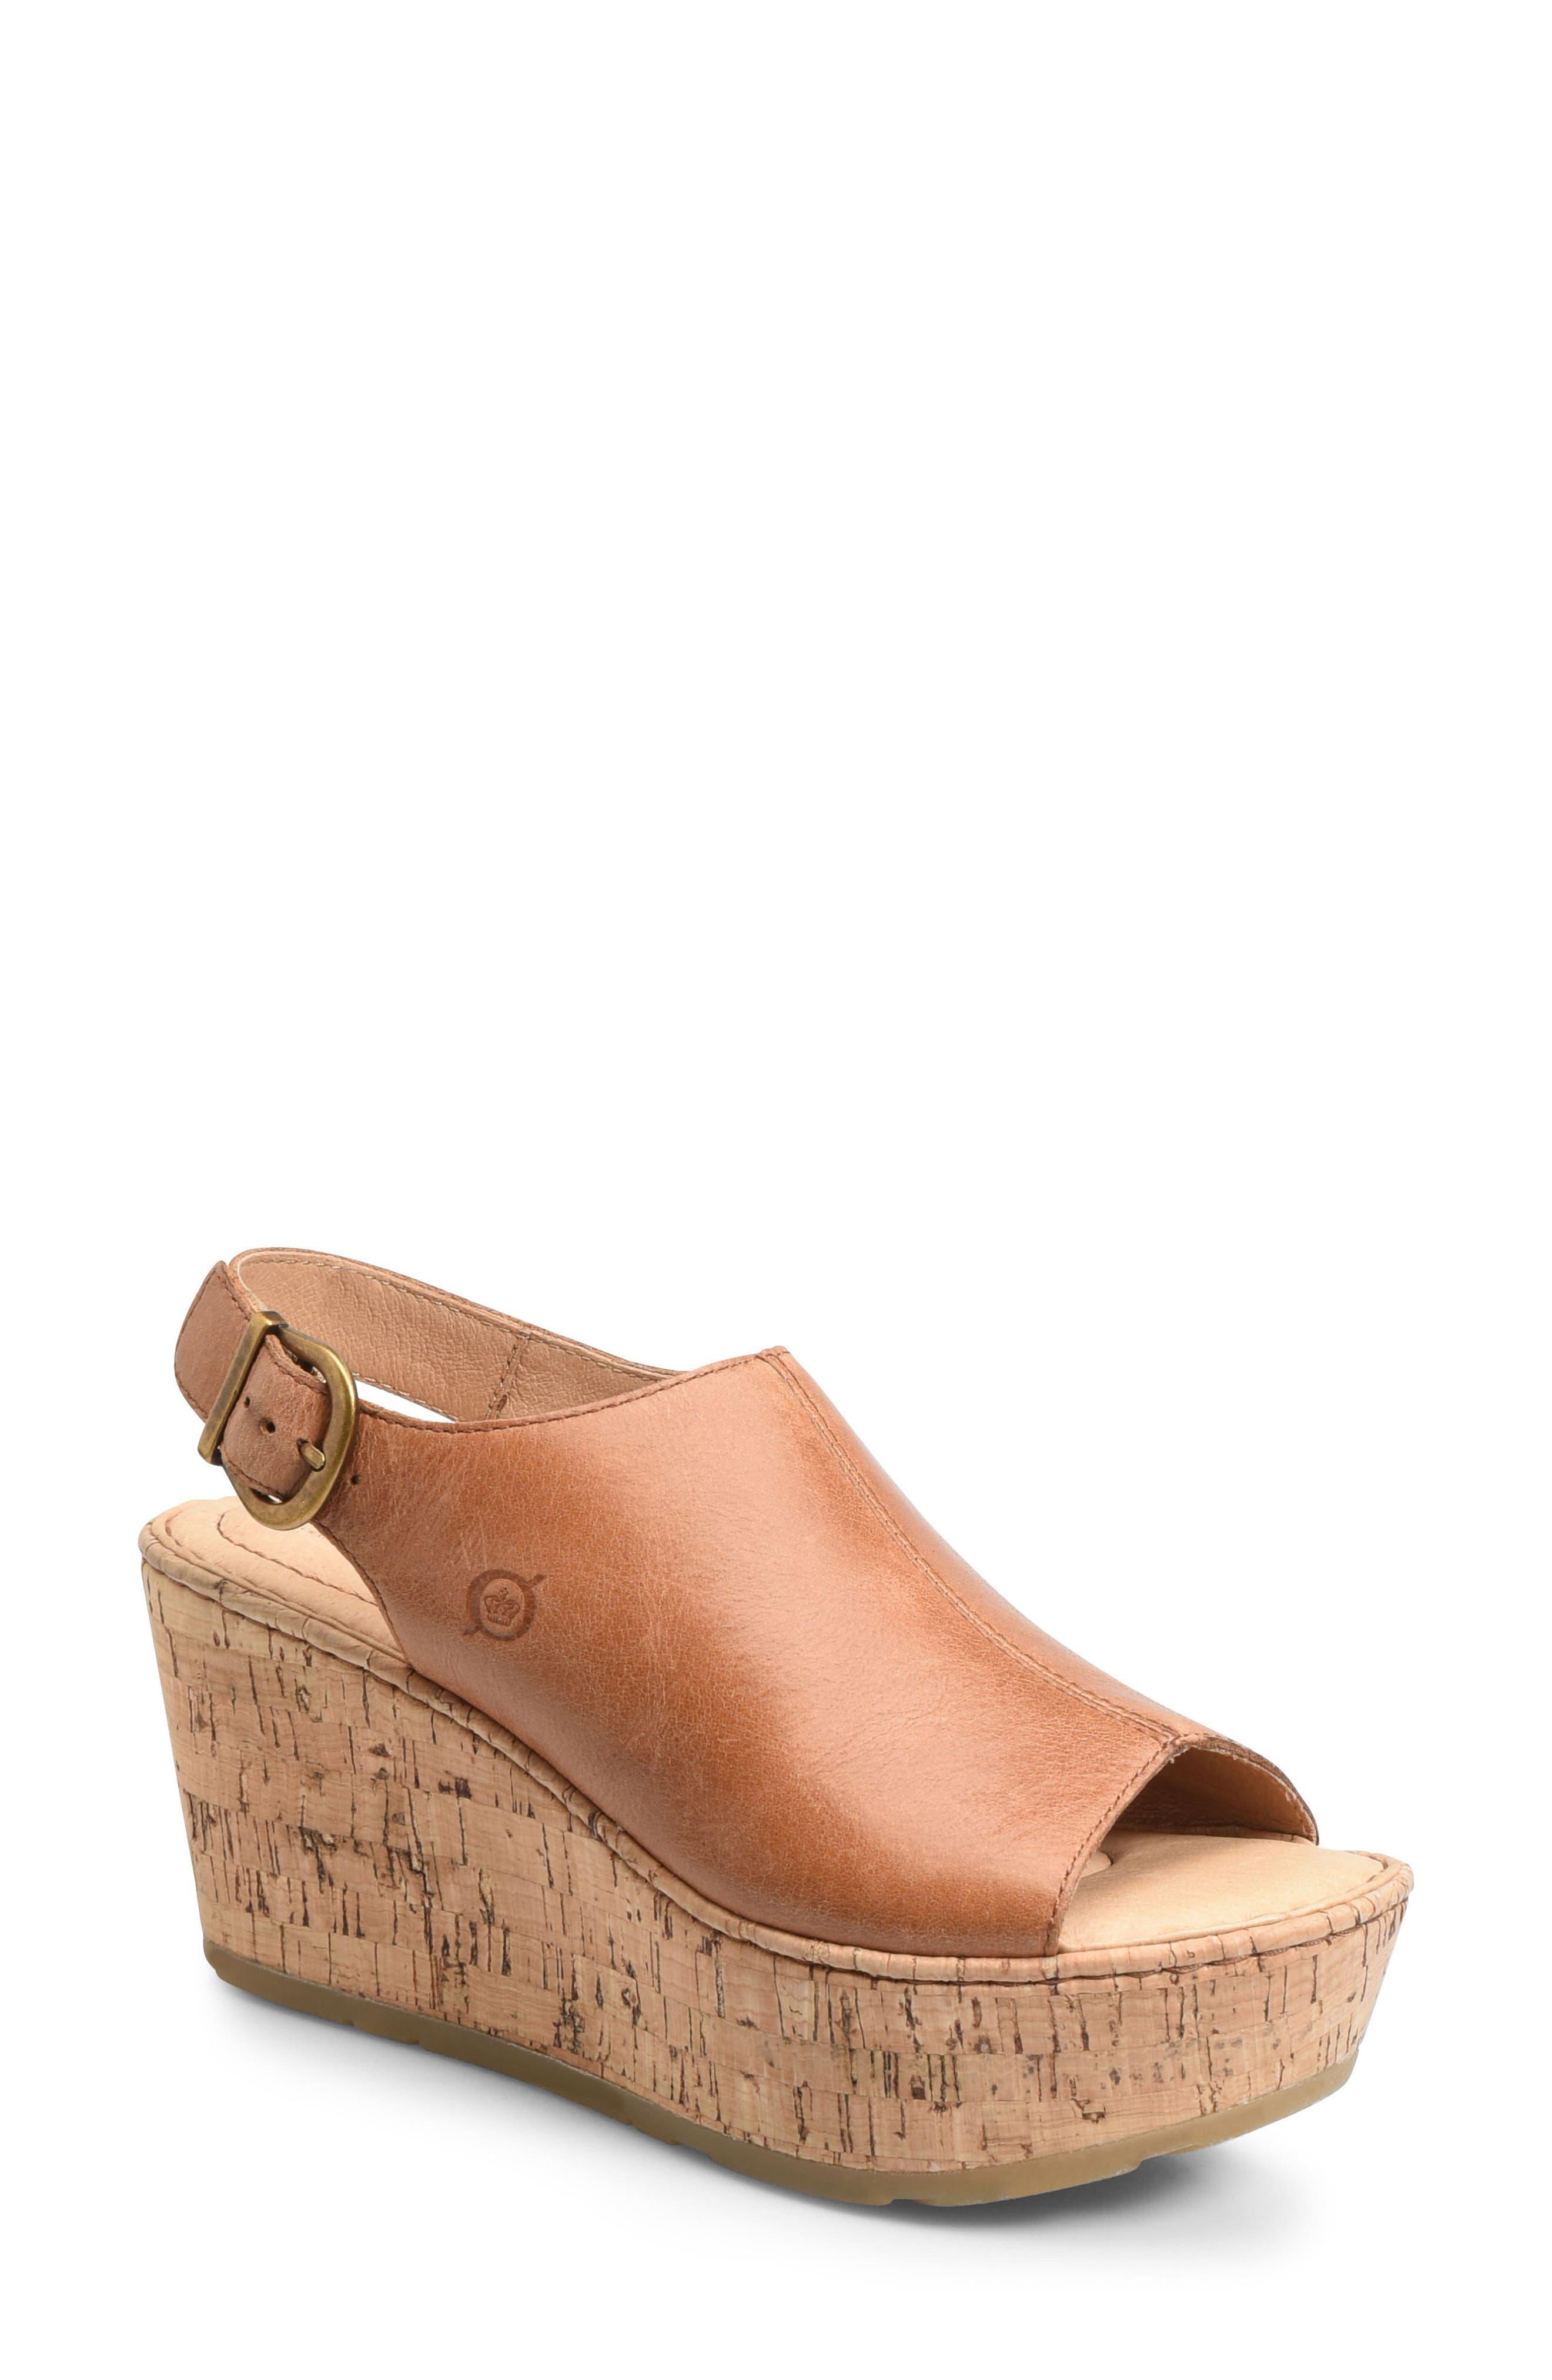 Orbit Platform Wedge Sandal,                             Main thumbnail 1, color,                             Brown Leather